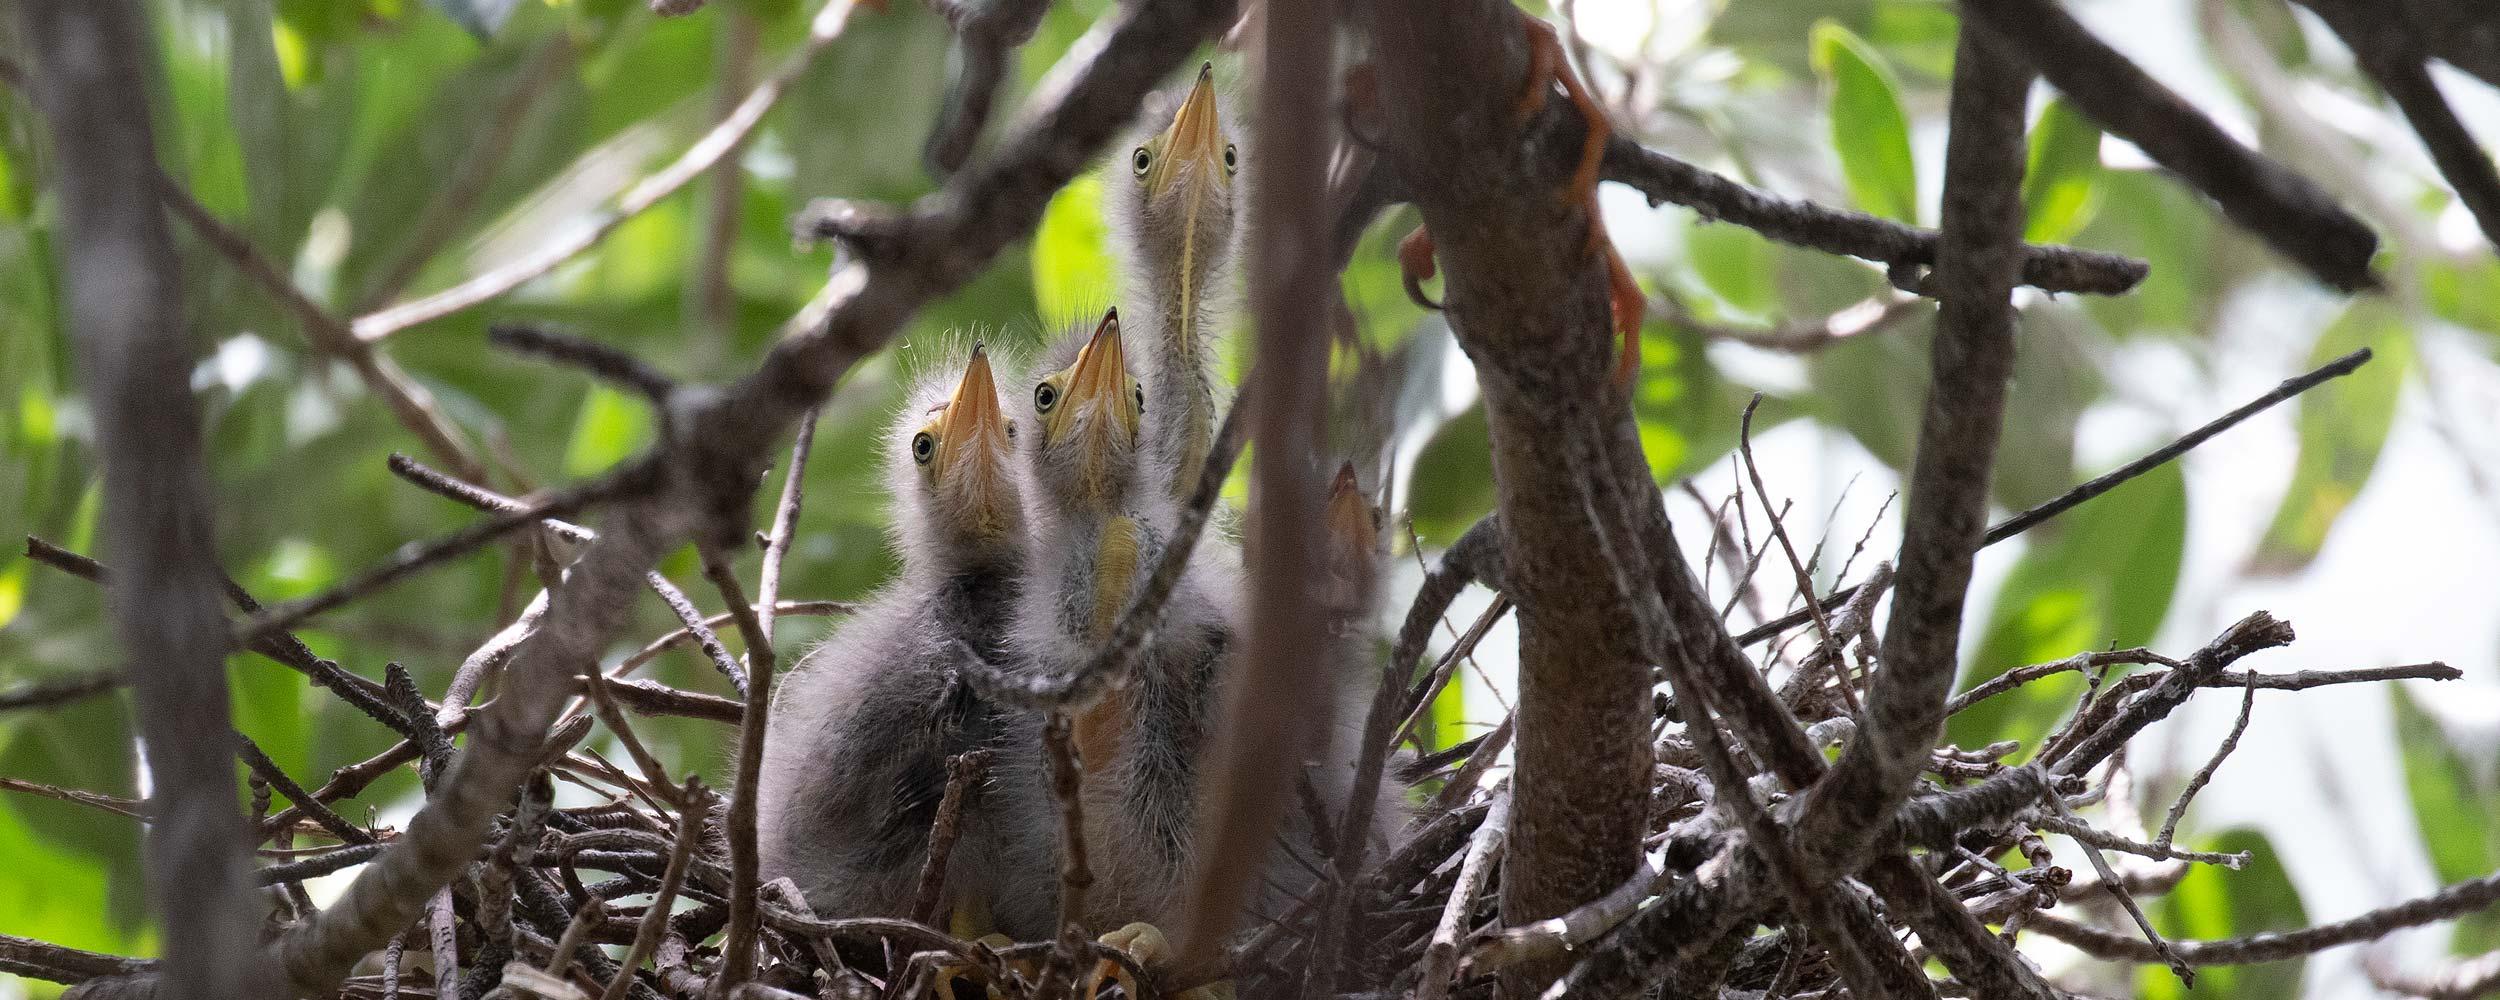 Baby birds image